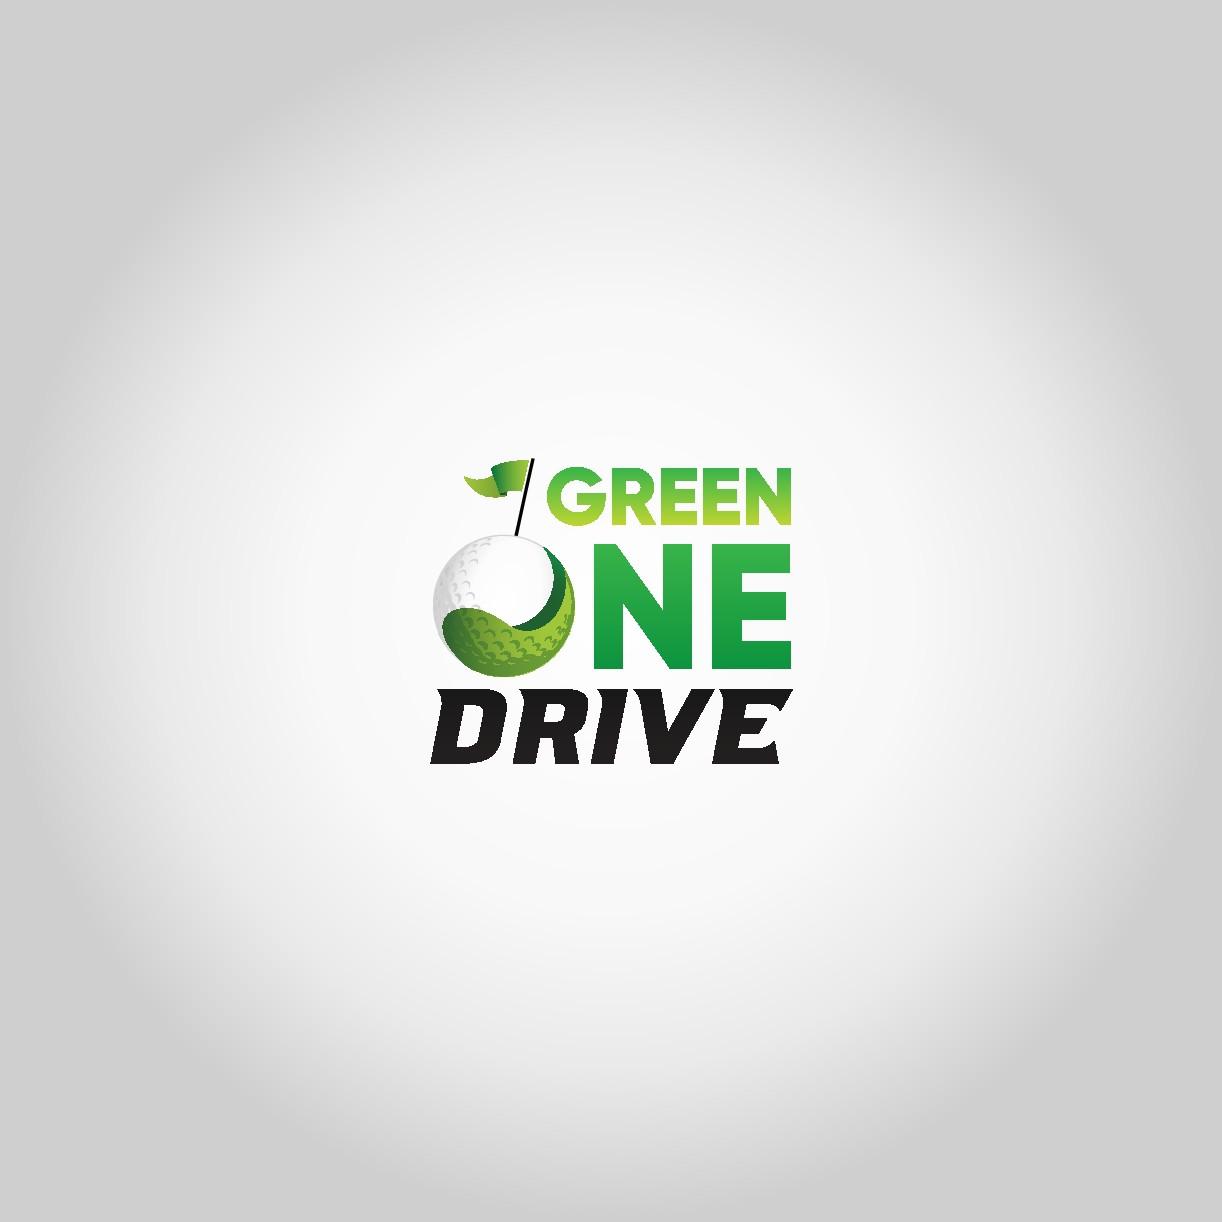 Green one drive logo